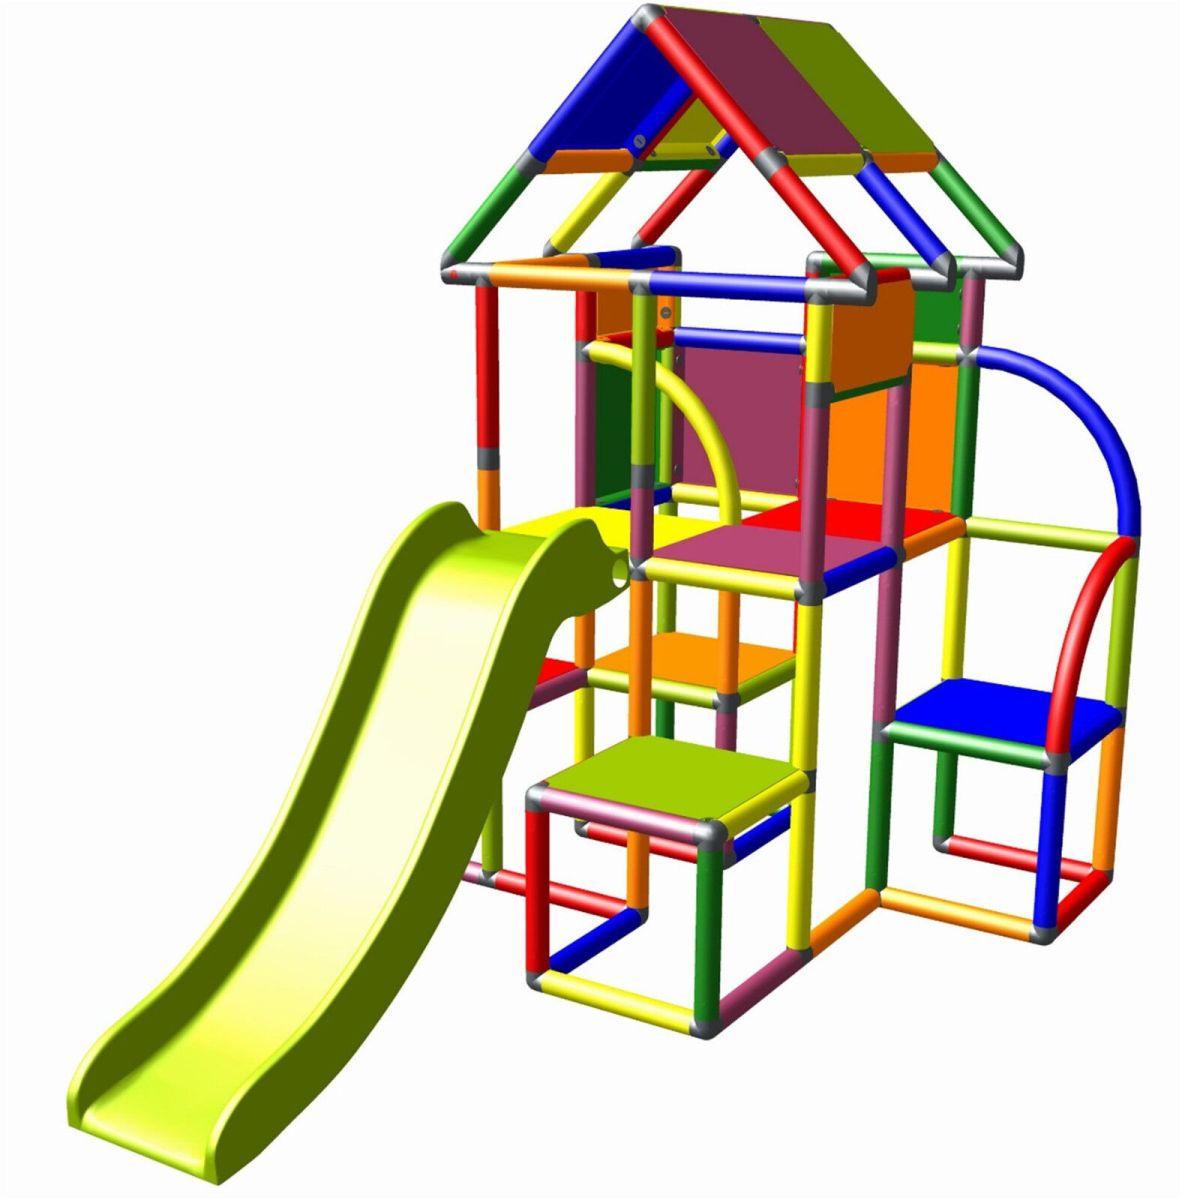 Moveandstic Lina Spielturm mit Dach und Rutsche Kletterturm Klettergerüst multic